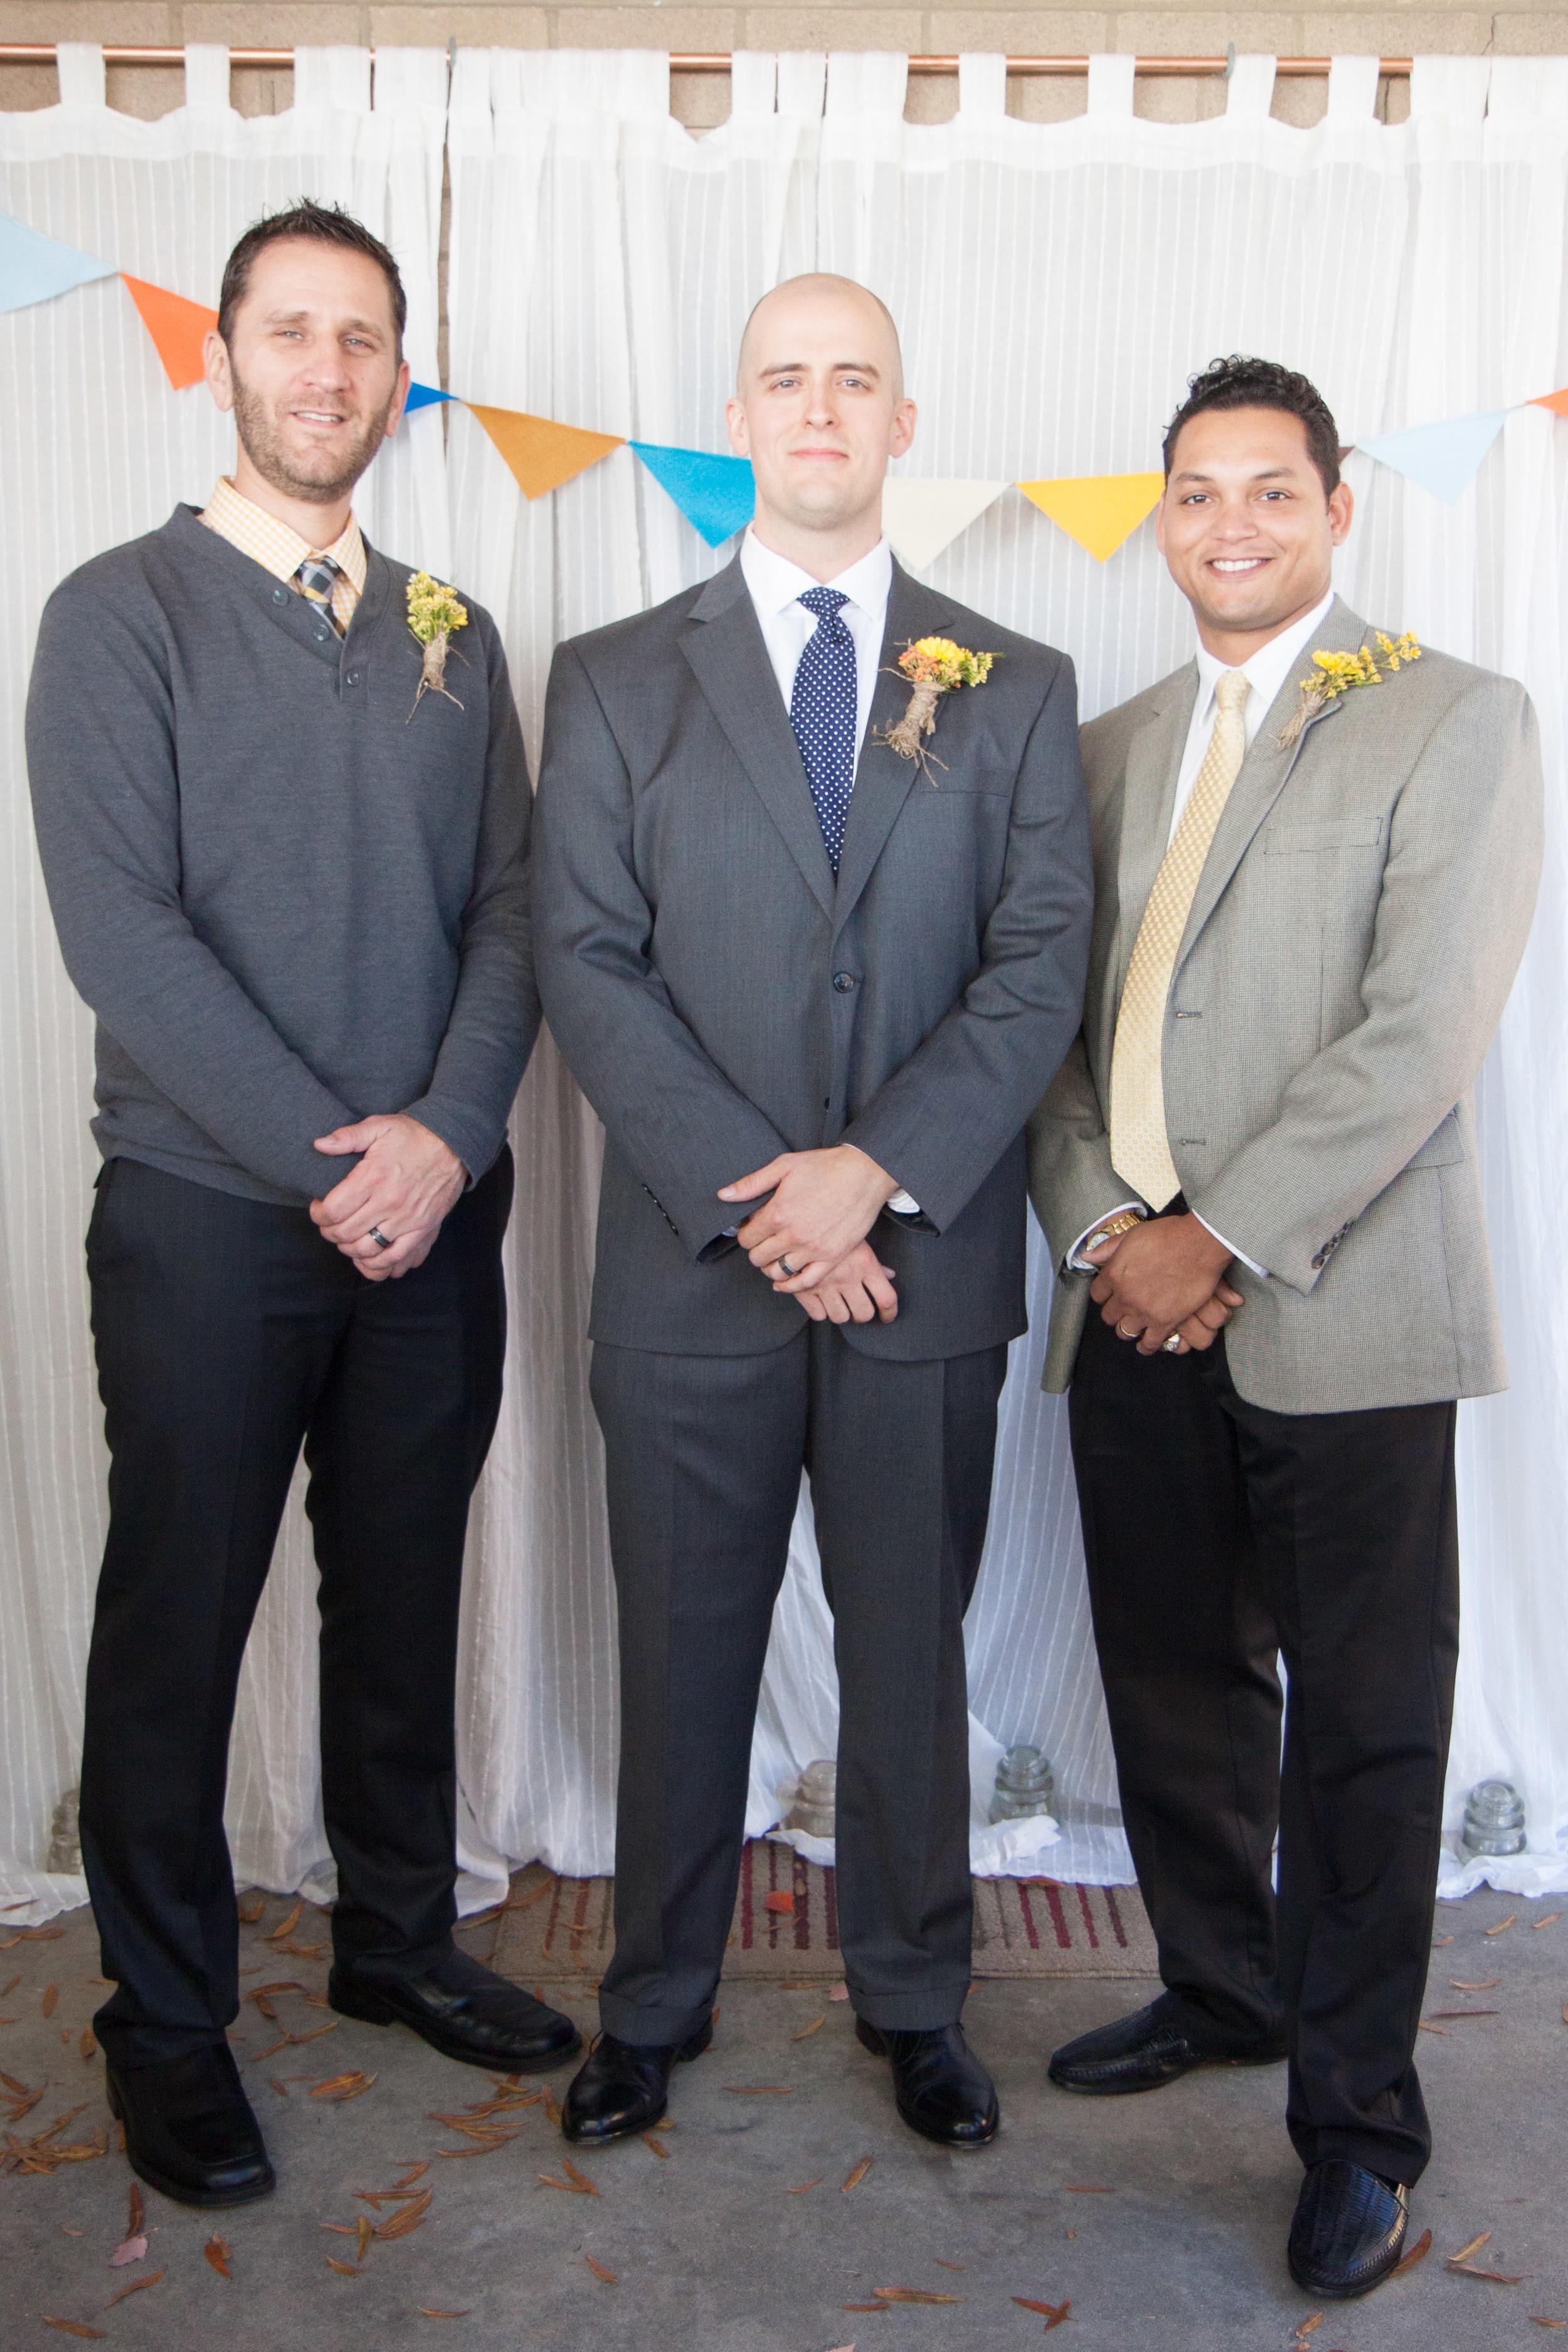 Wilson Bickel Wedding - Family Photos (6 of 25).jpg